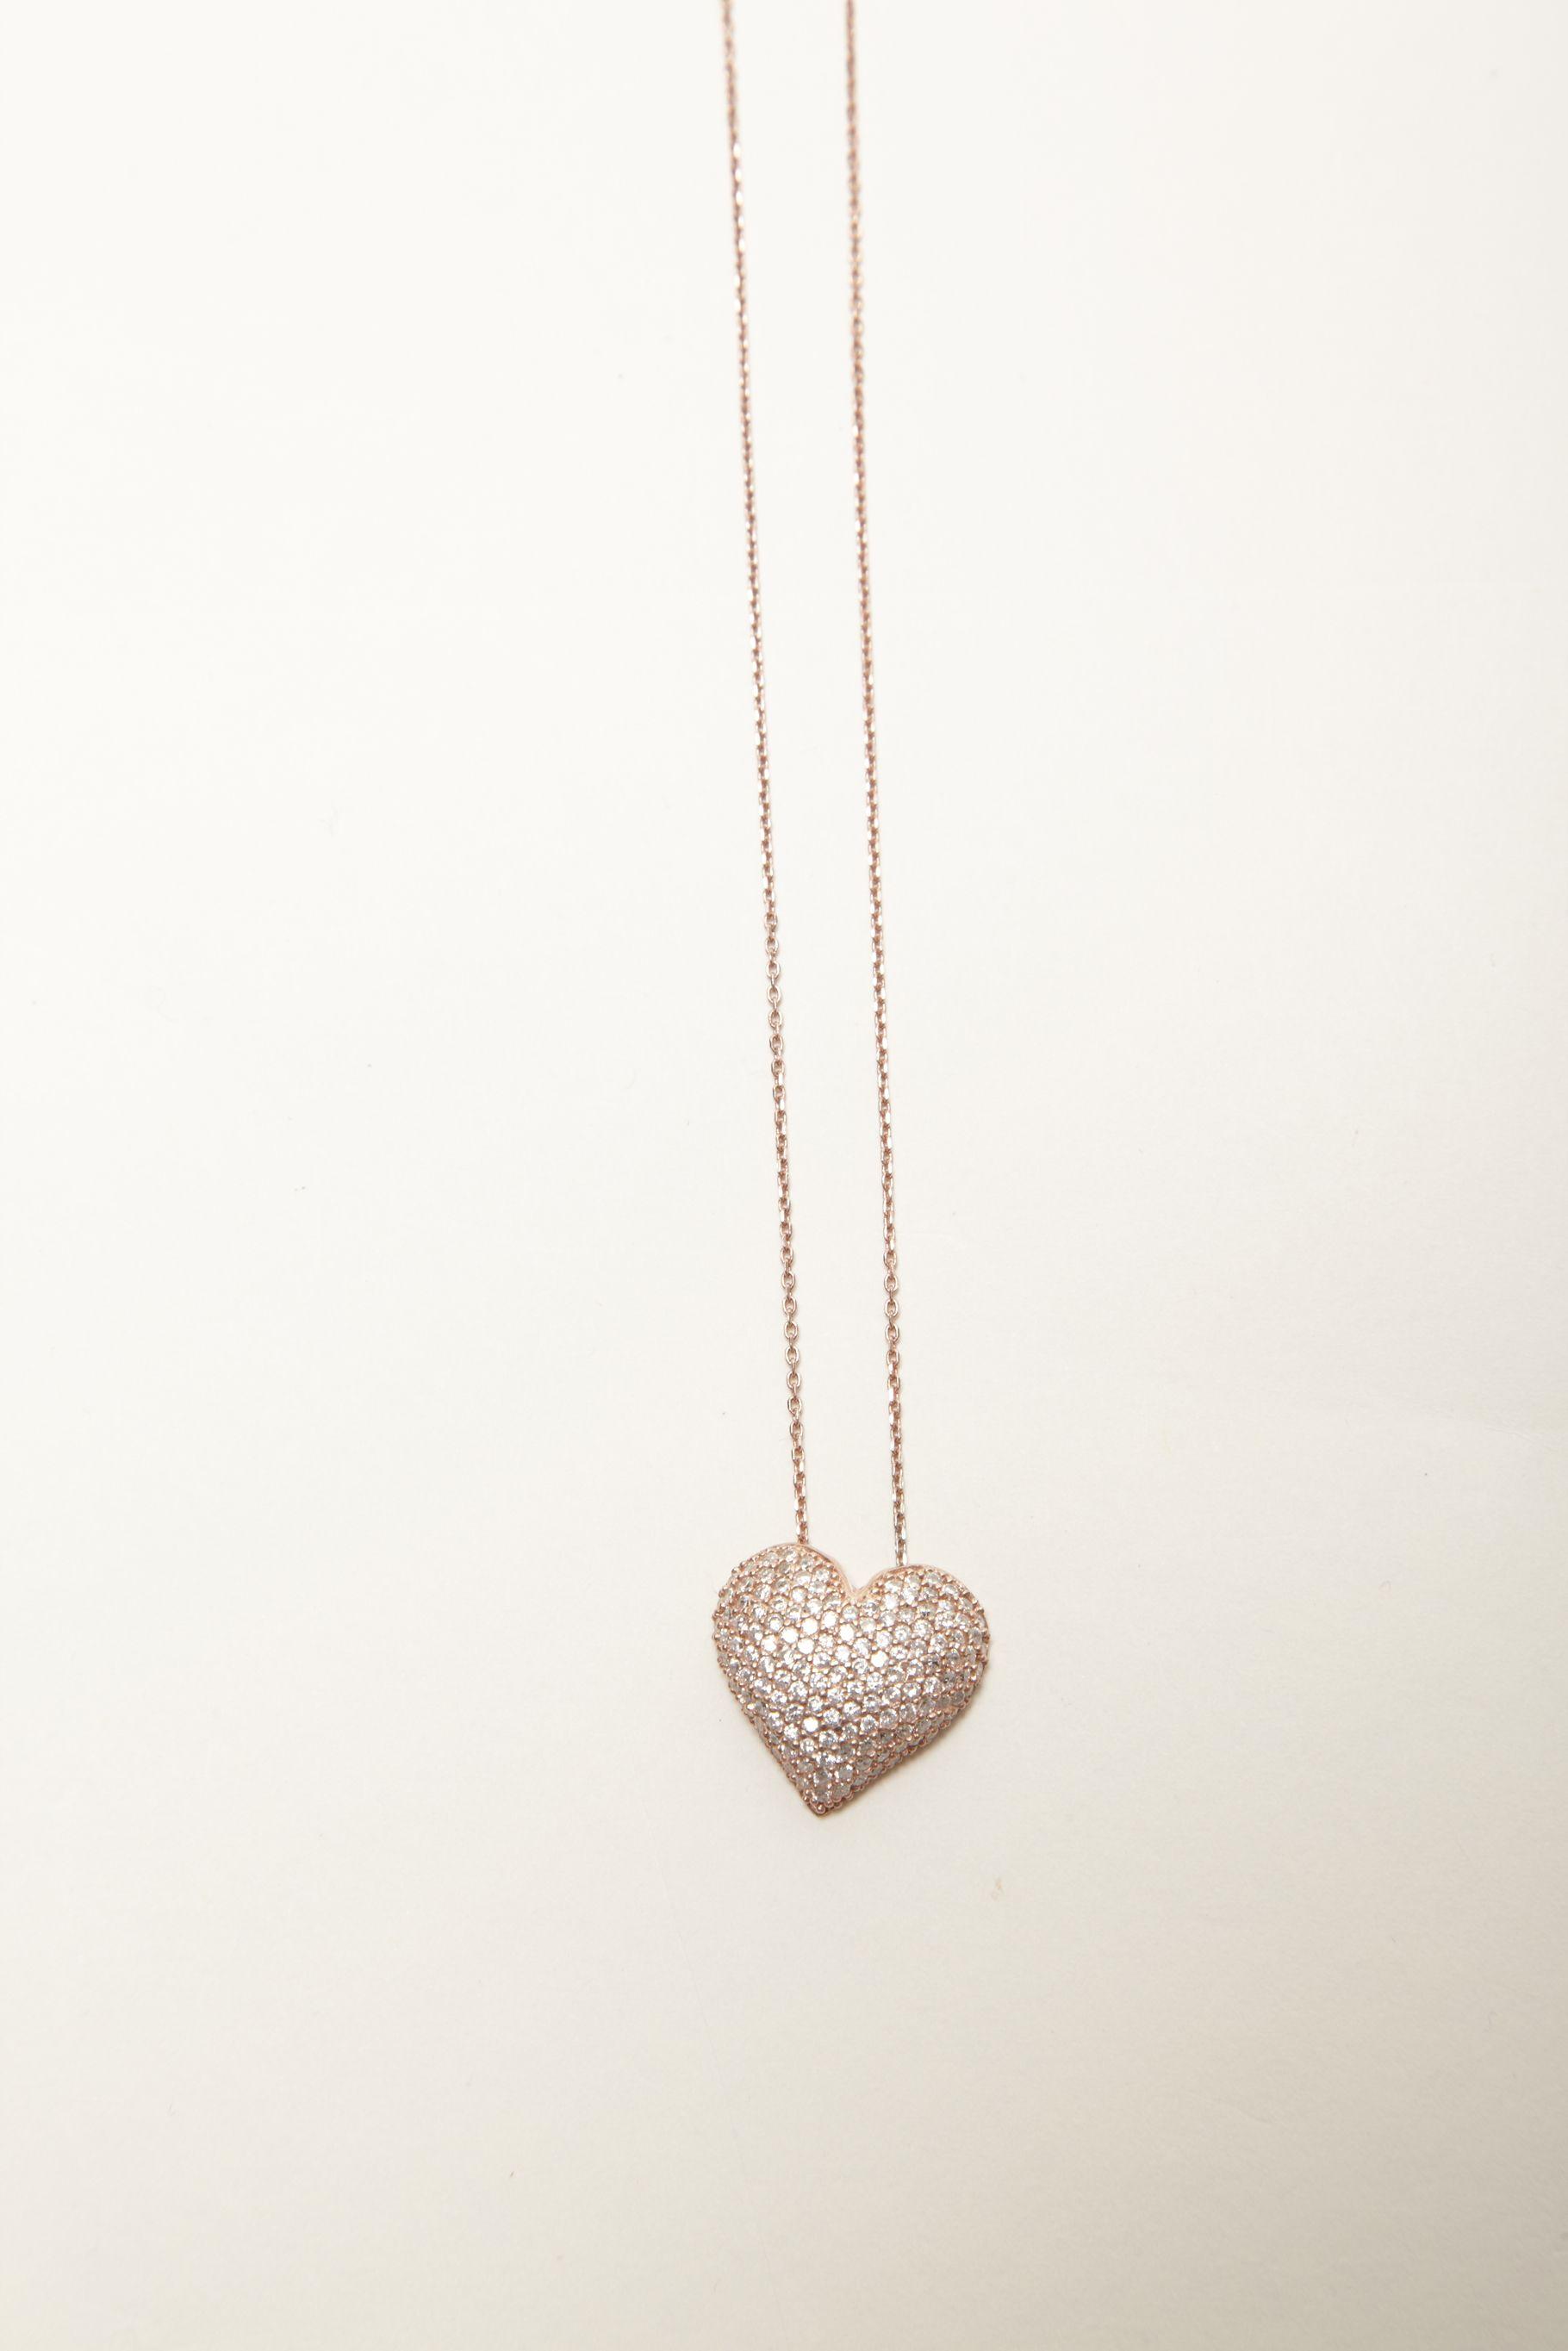 Paved Heart Necklace | Lauren Lynne